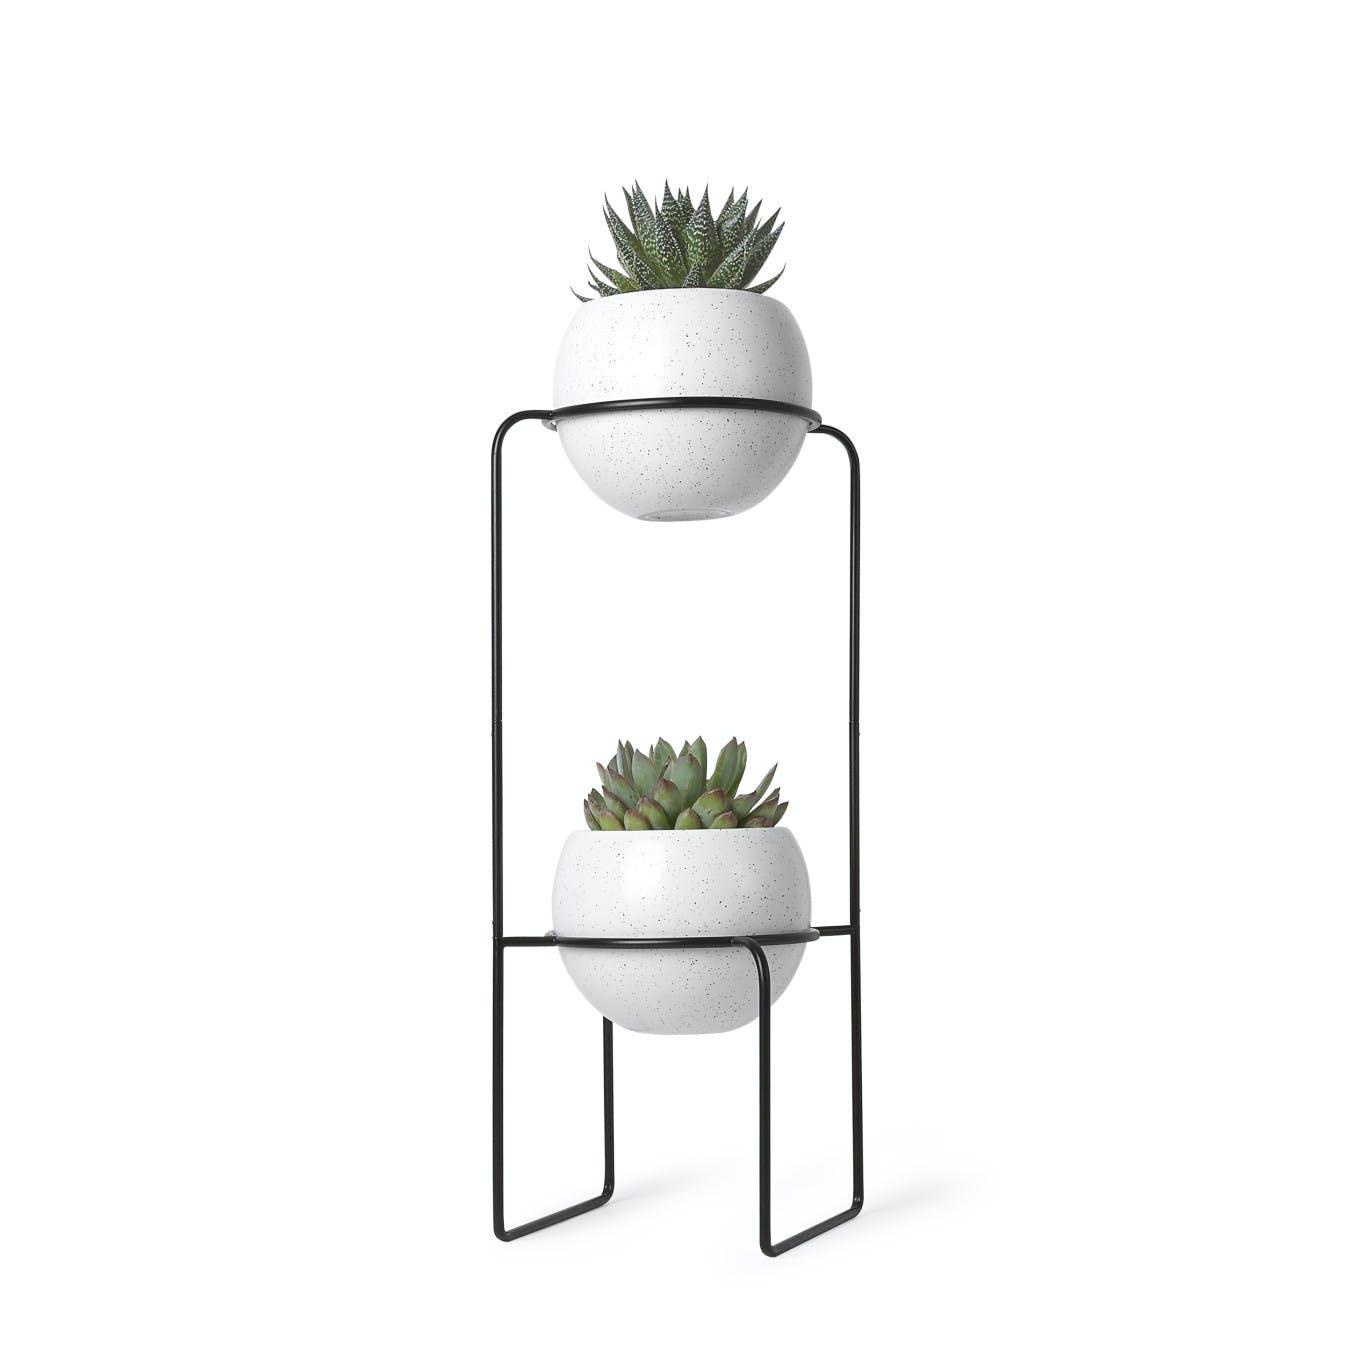 Nesta Freestand Planter in White with Speckle